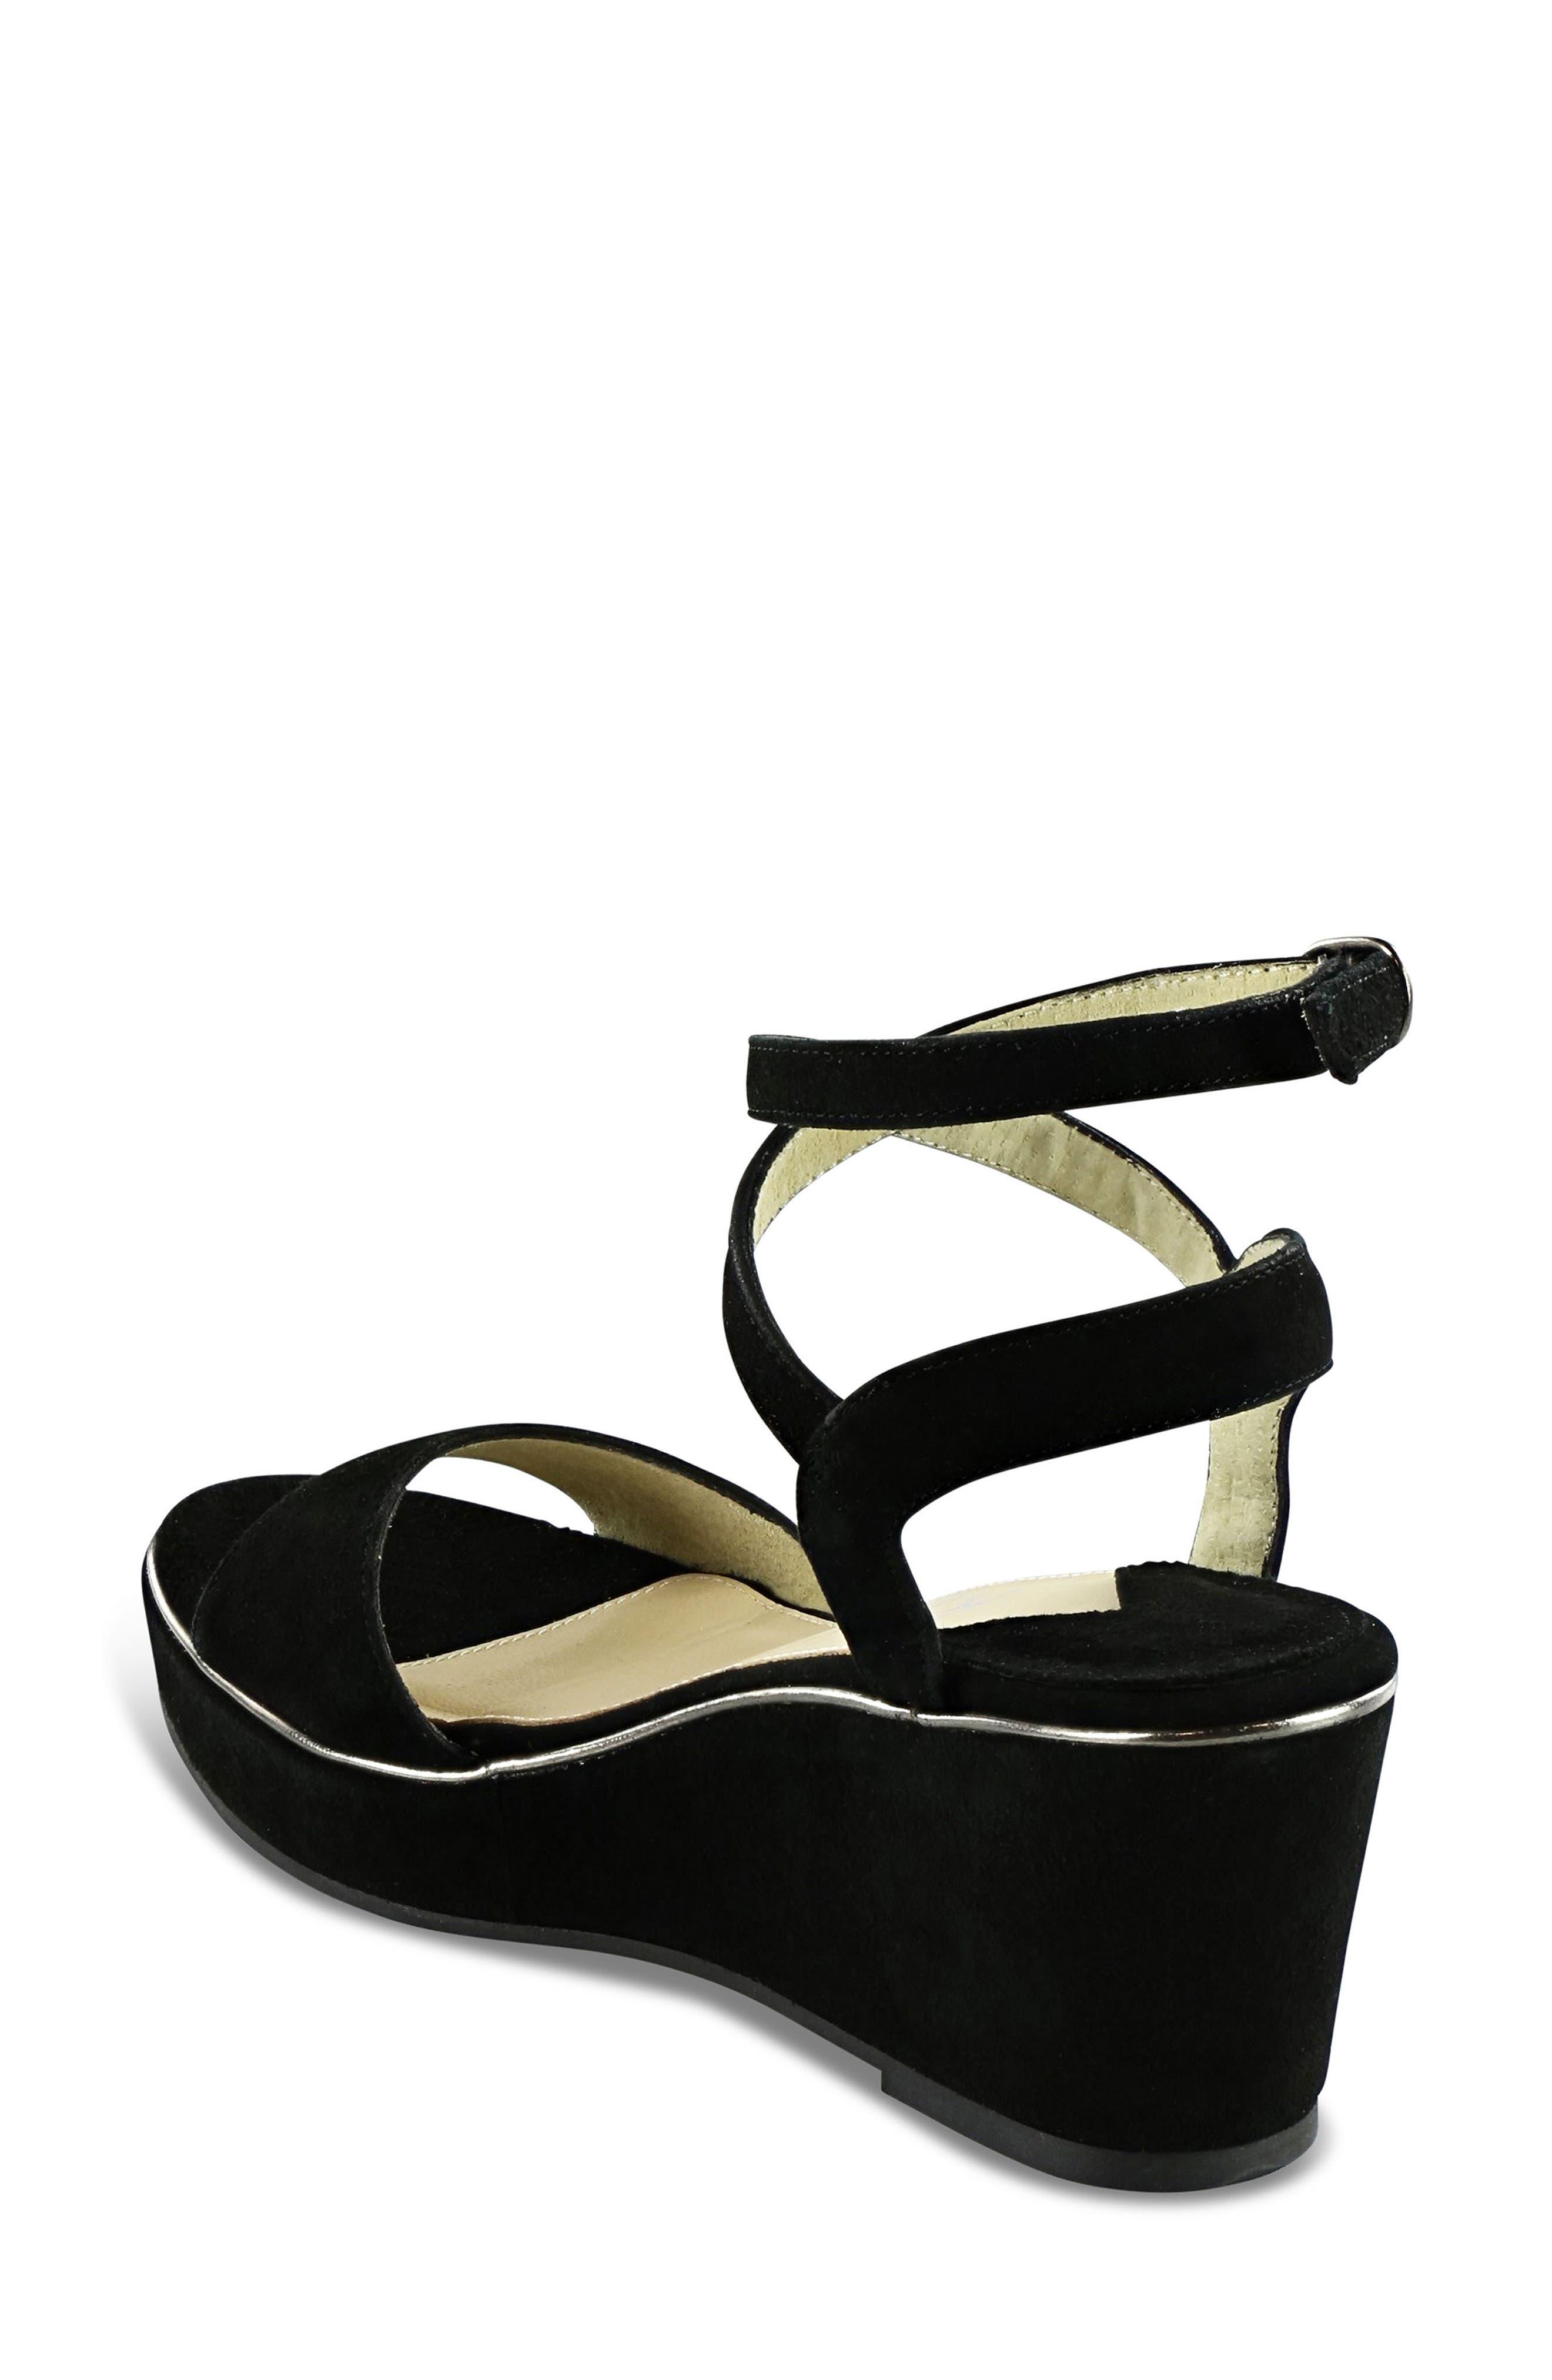 Sashi Platform Sandal,                             Alternate thumbnail 2, color,                             Black Suede